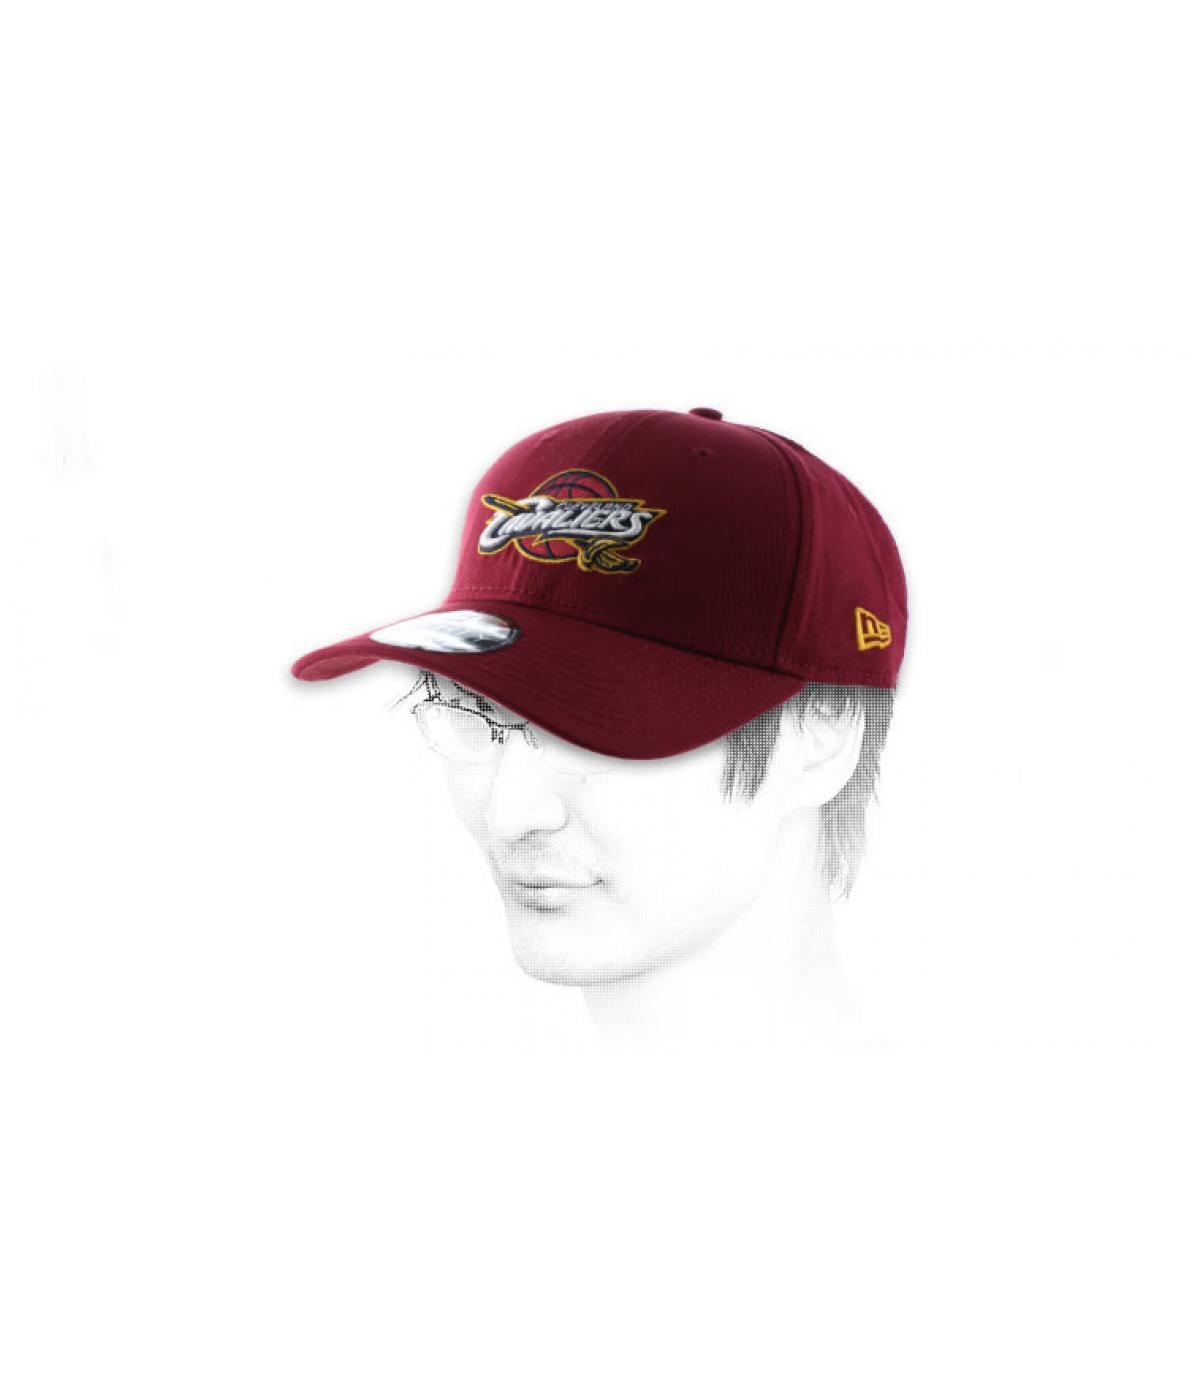 Rosa Cap Cleveland Cavaliers